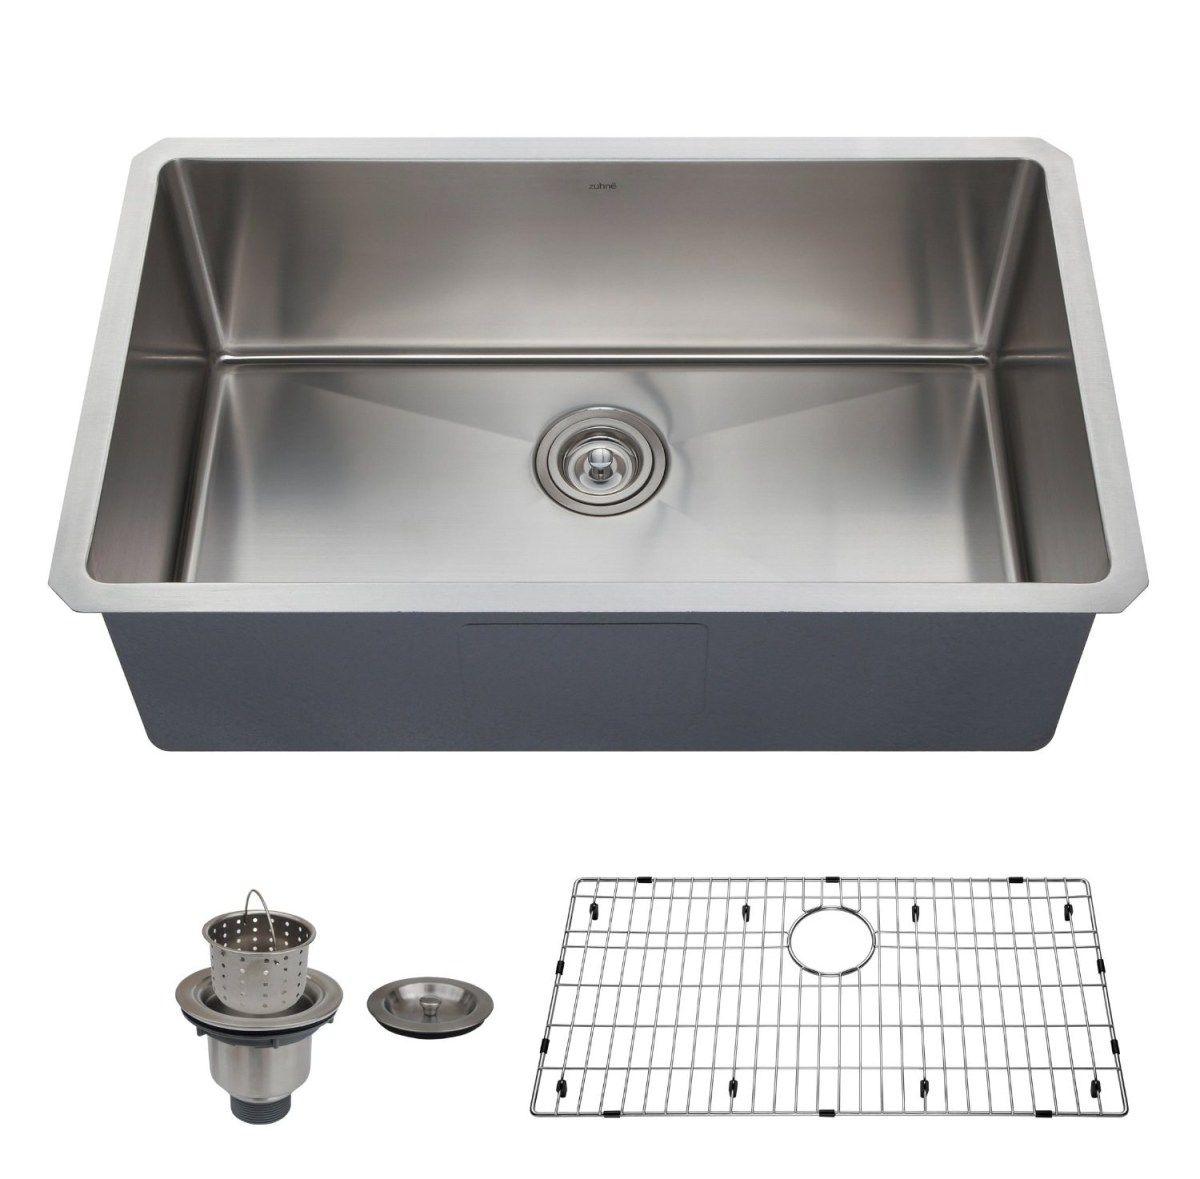 Ceramic Kitchen Sinks Pros And Cons Best Single Bowl Kitchen Sink